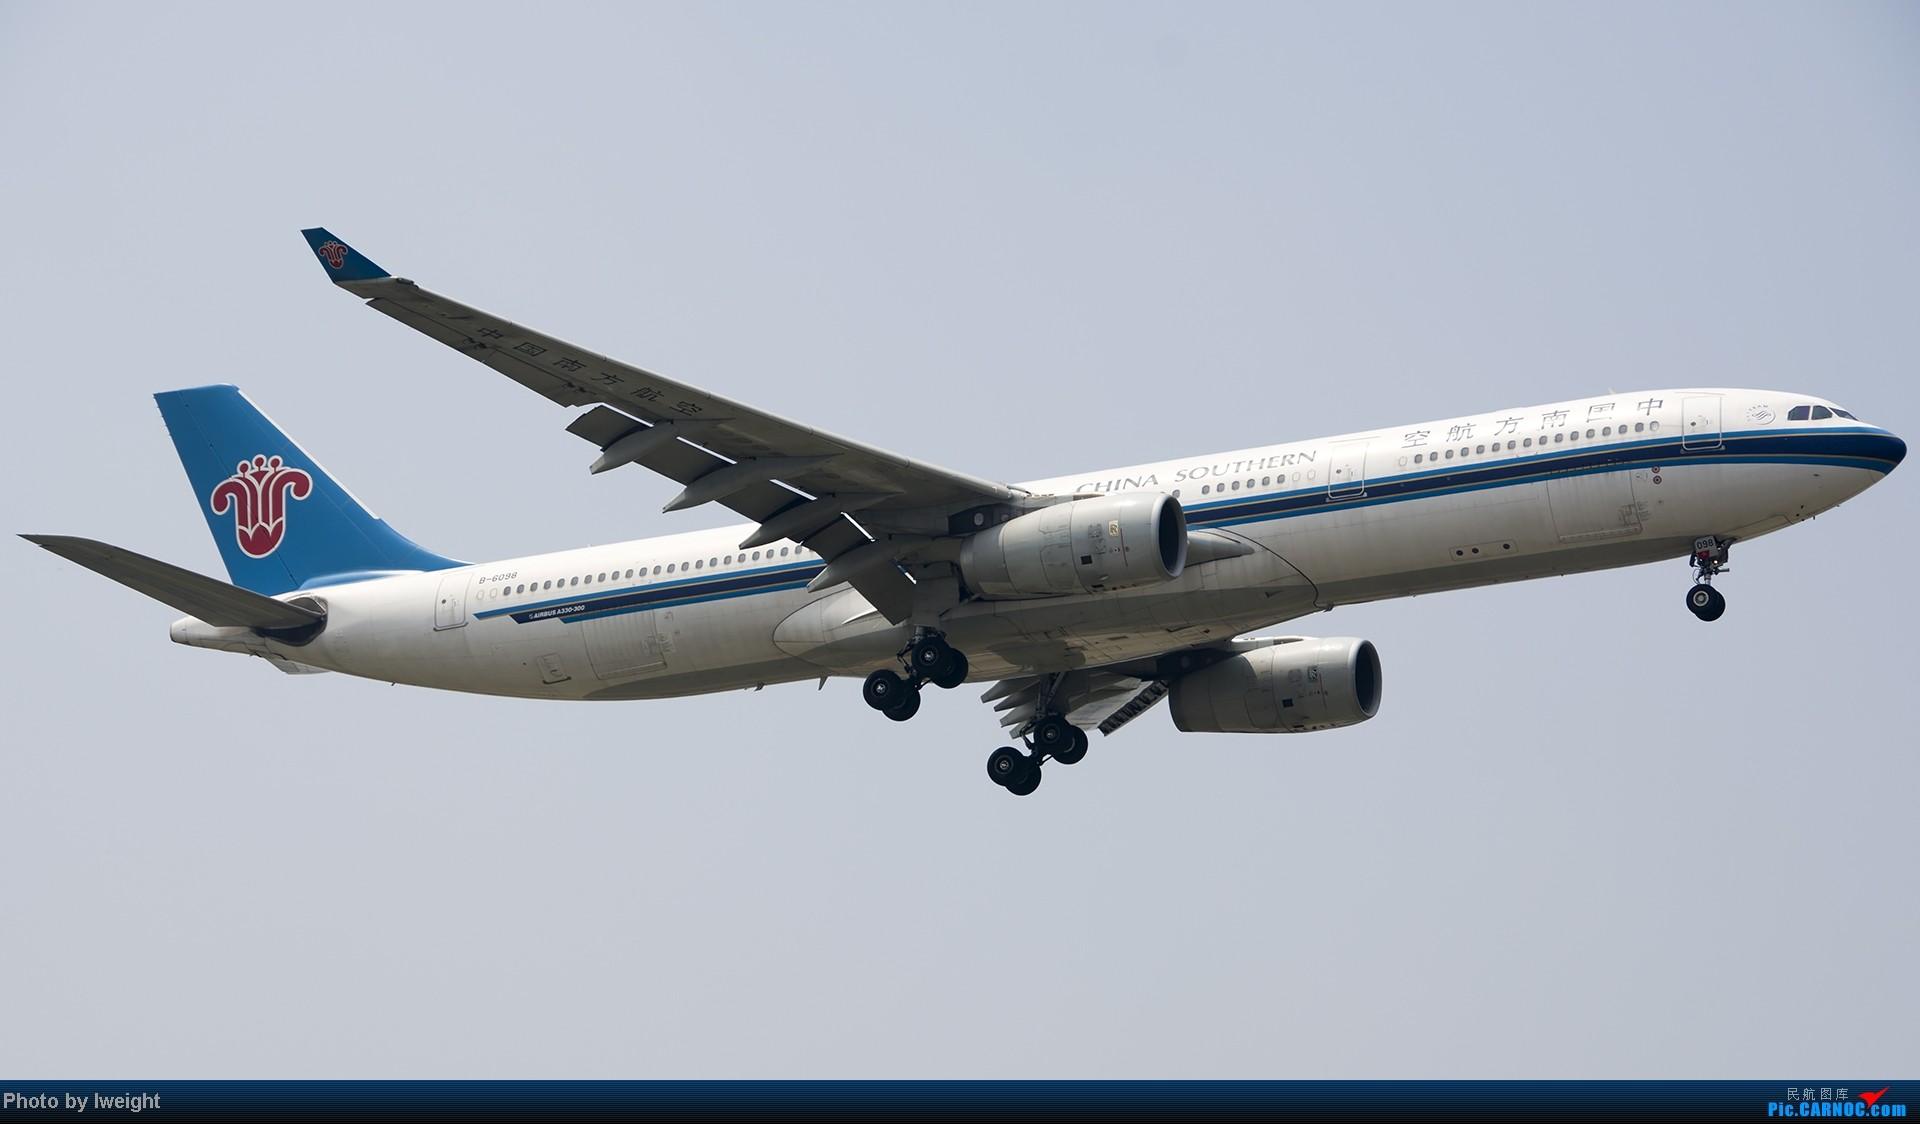 Re:[原创]休假无聊,跑道边来拍机玩(晚点的ZestAir、换装的B6100和刚交付的B2738等) AIRBUS A330-300 B-6098 中国北京首都机场